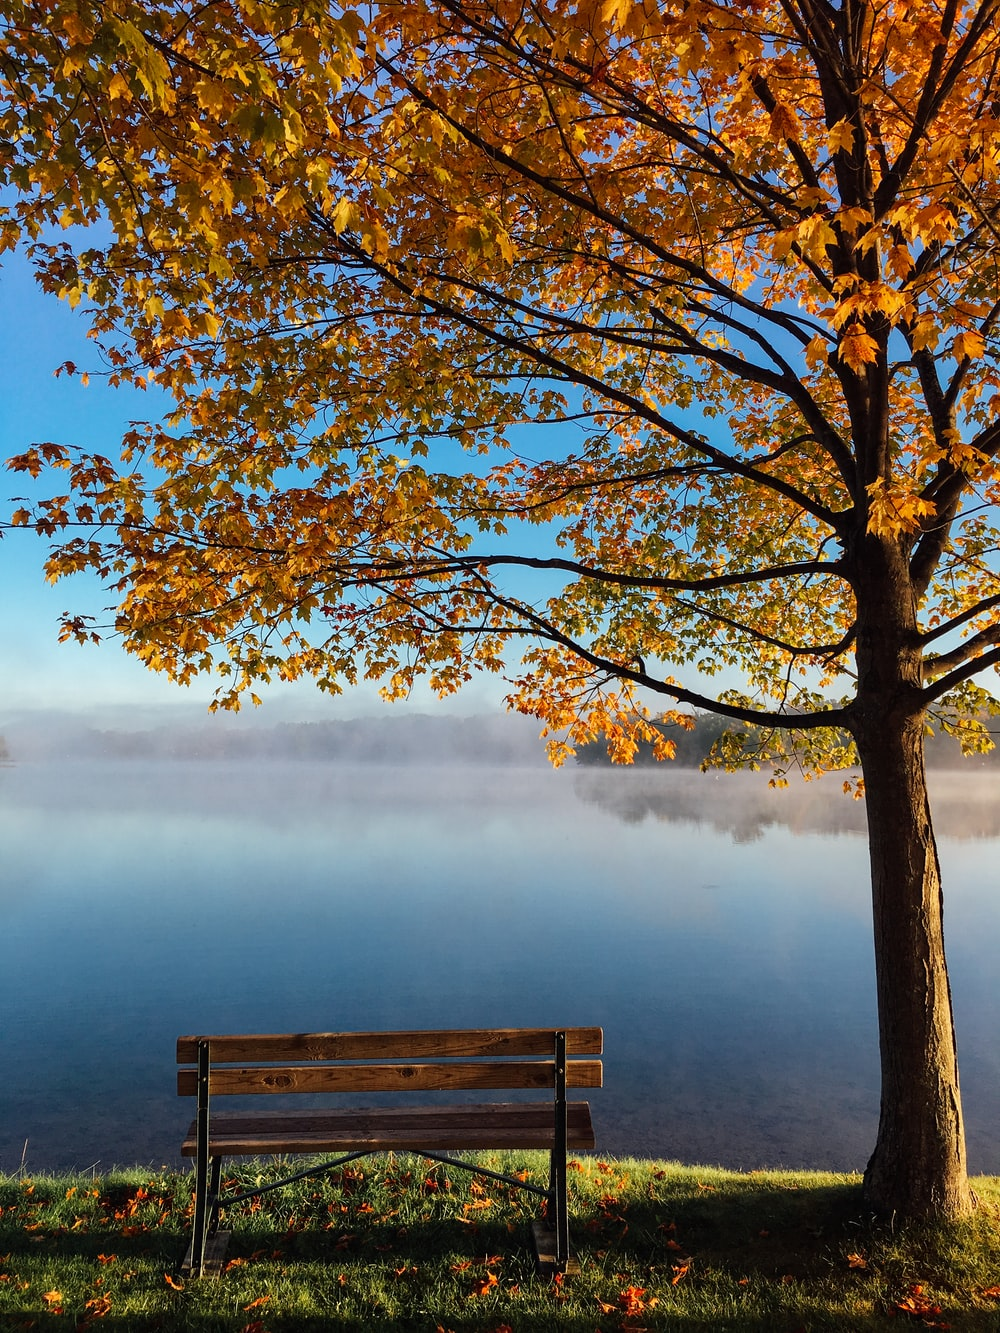 brown wooden bench beside tree